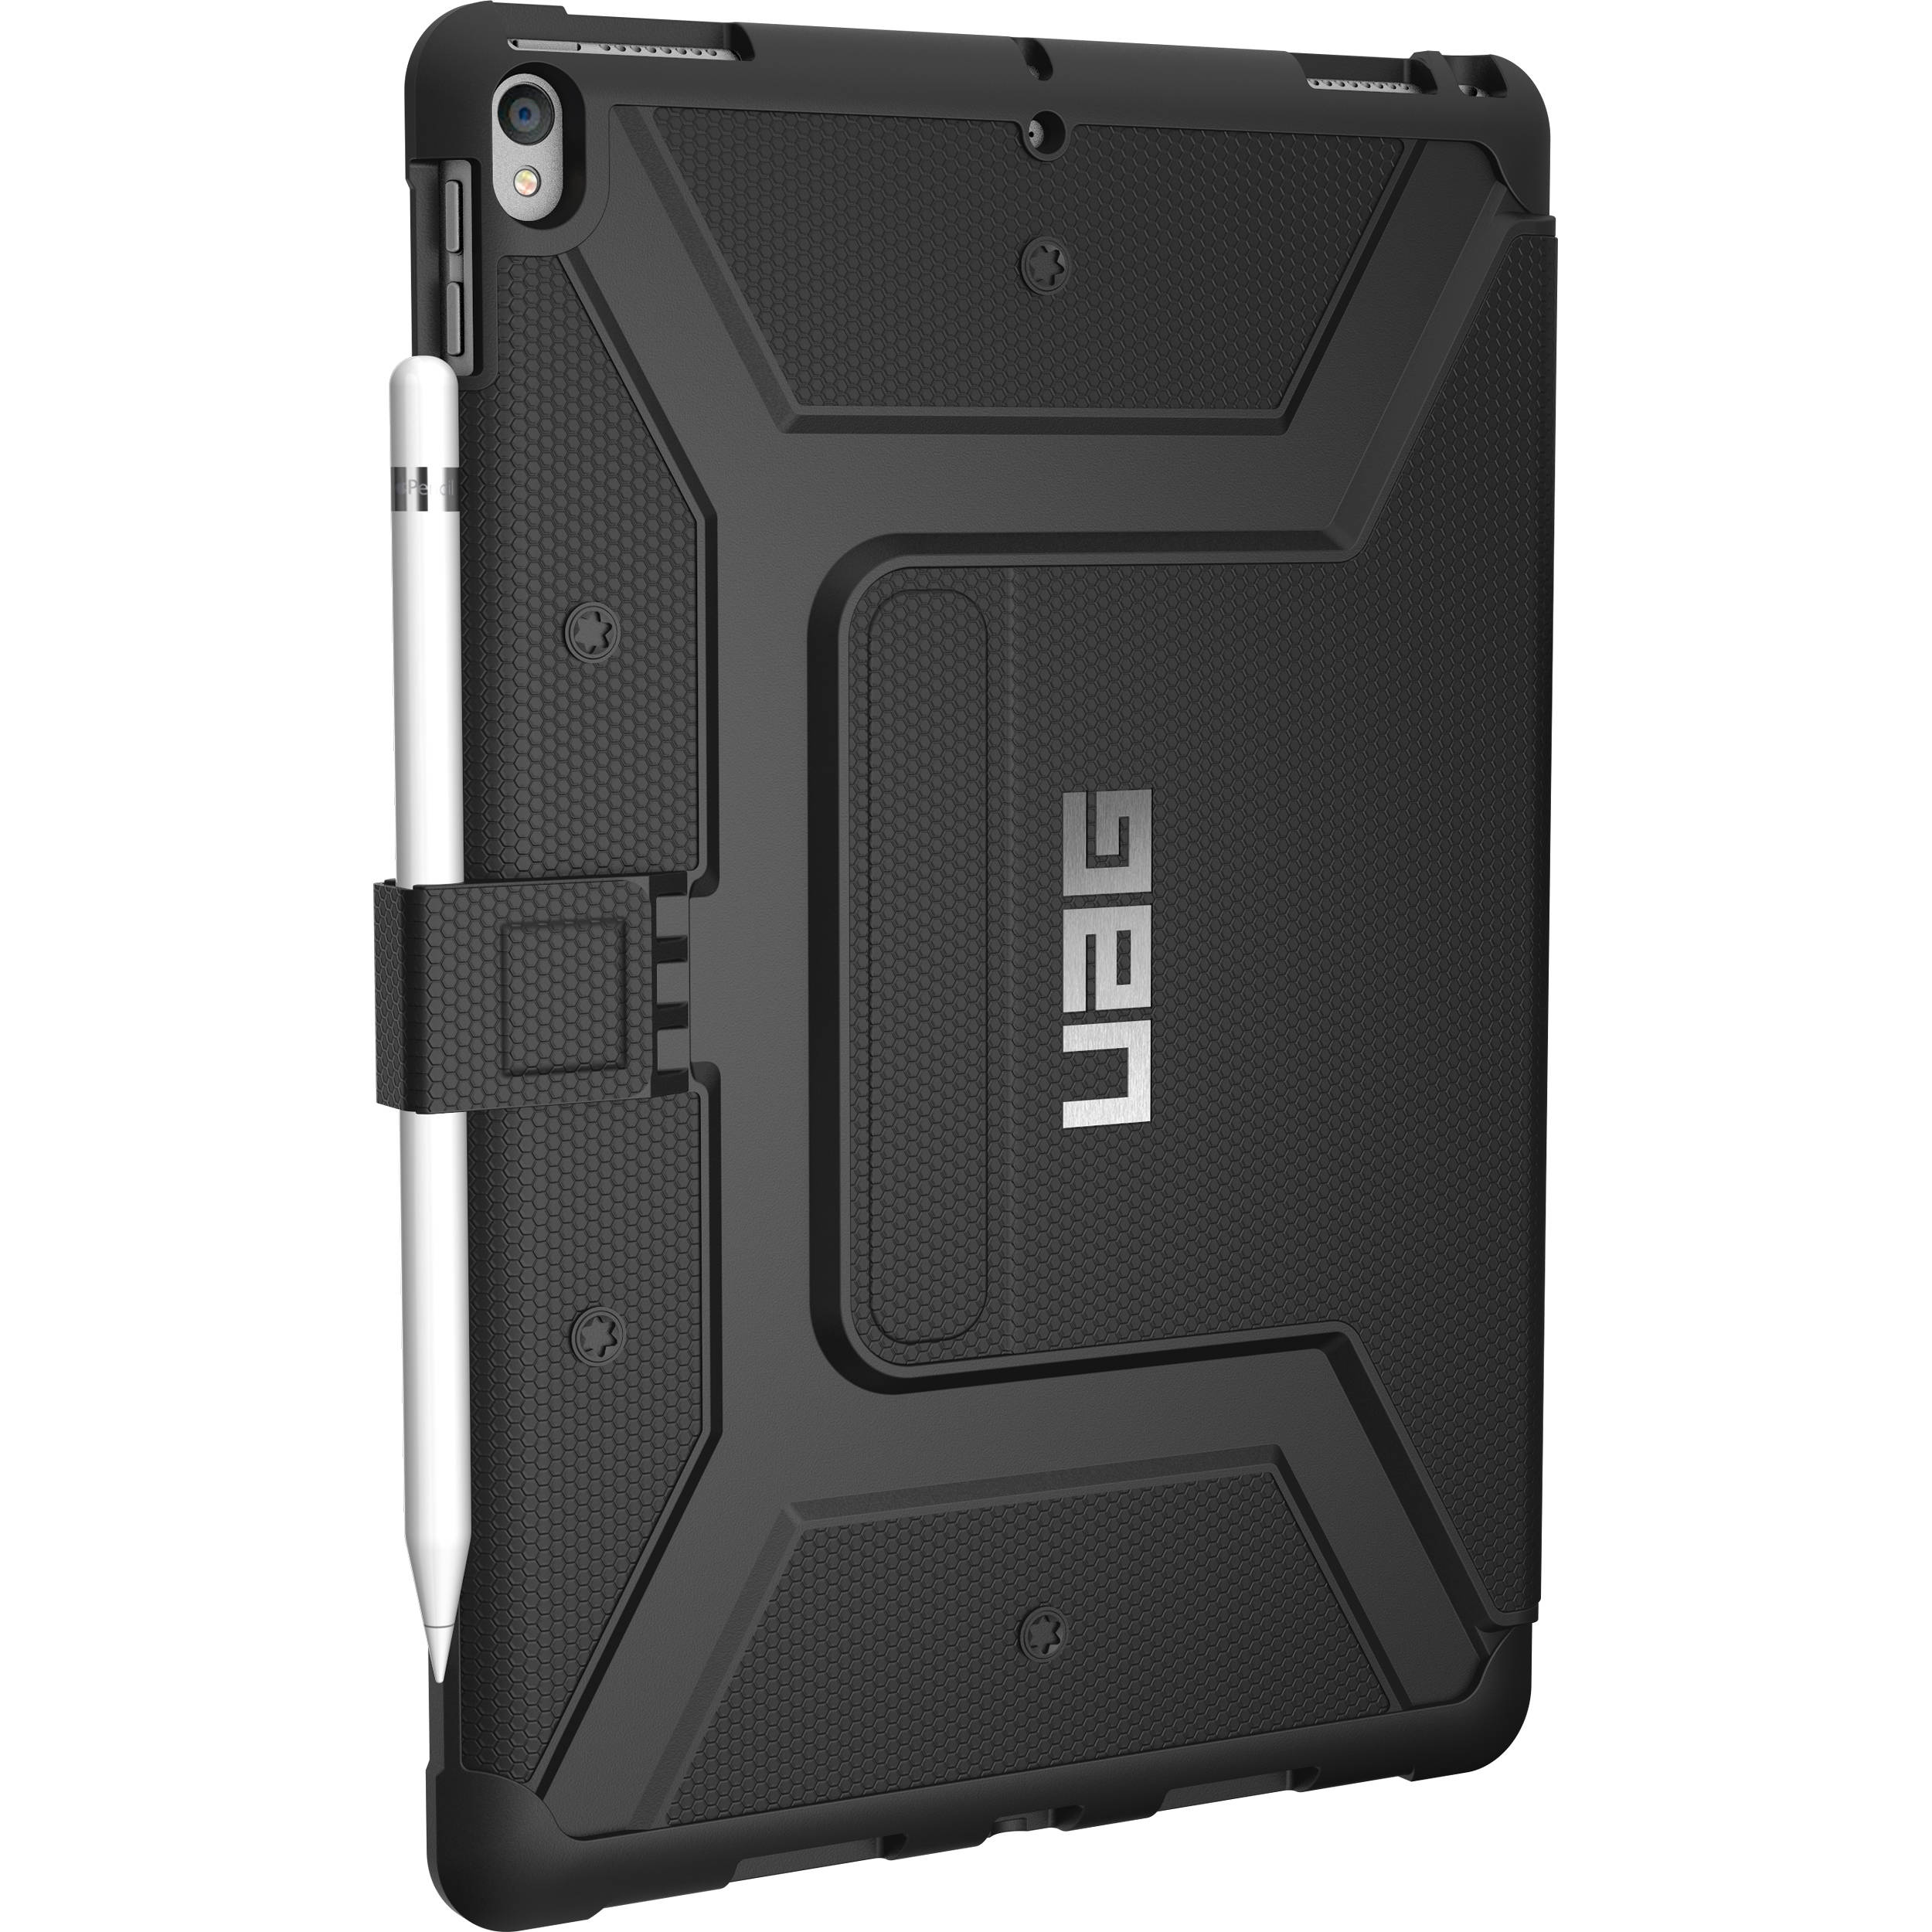 512333574 Urban Armor Gear Metropolis Case for iPad Pro IPDP10.5-E-BK B&H